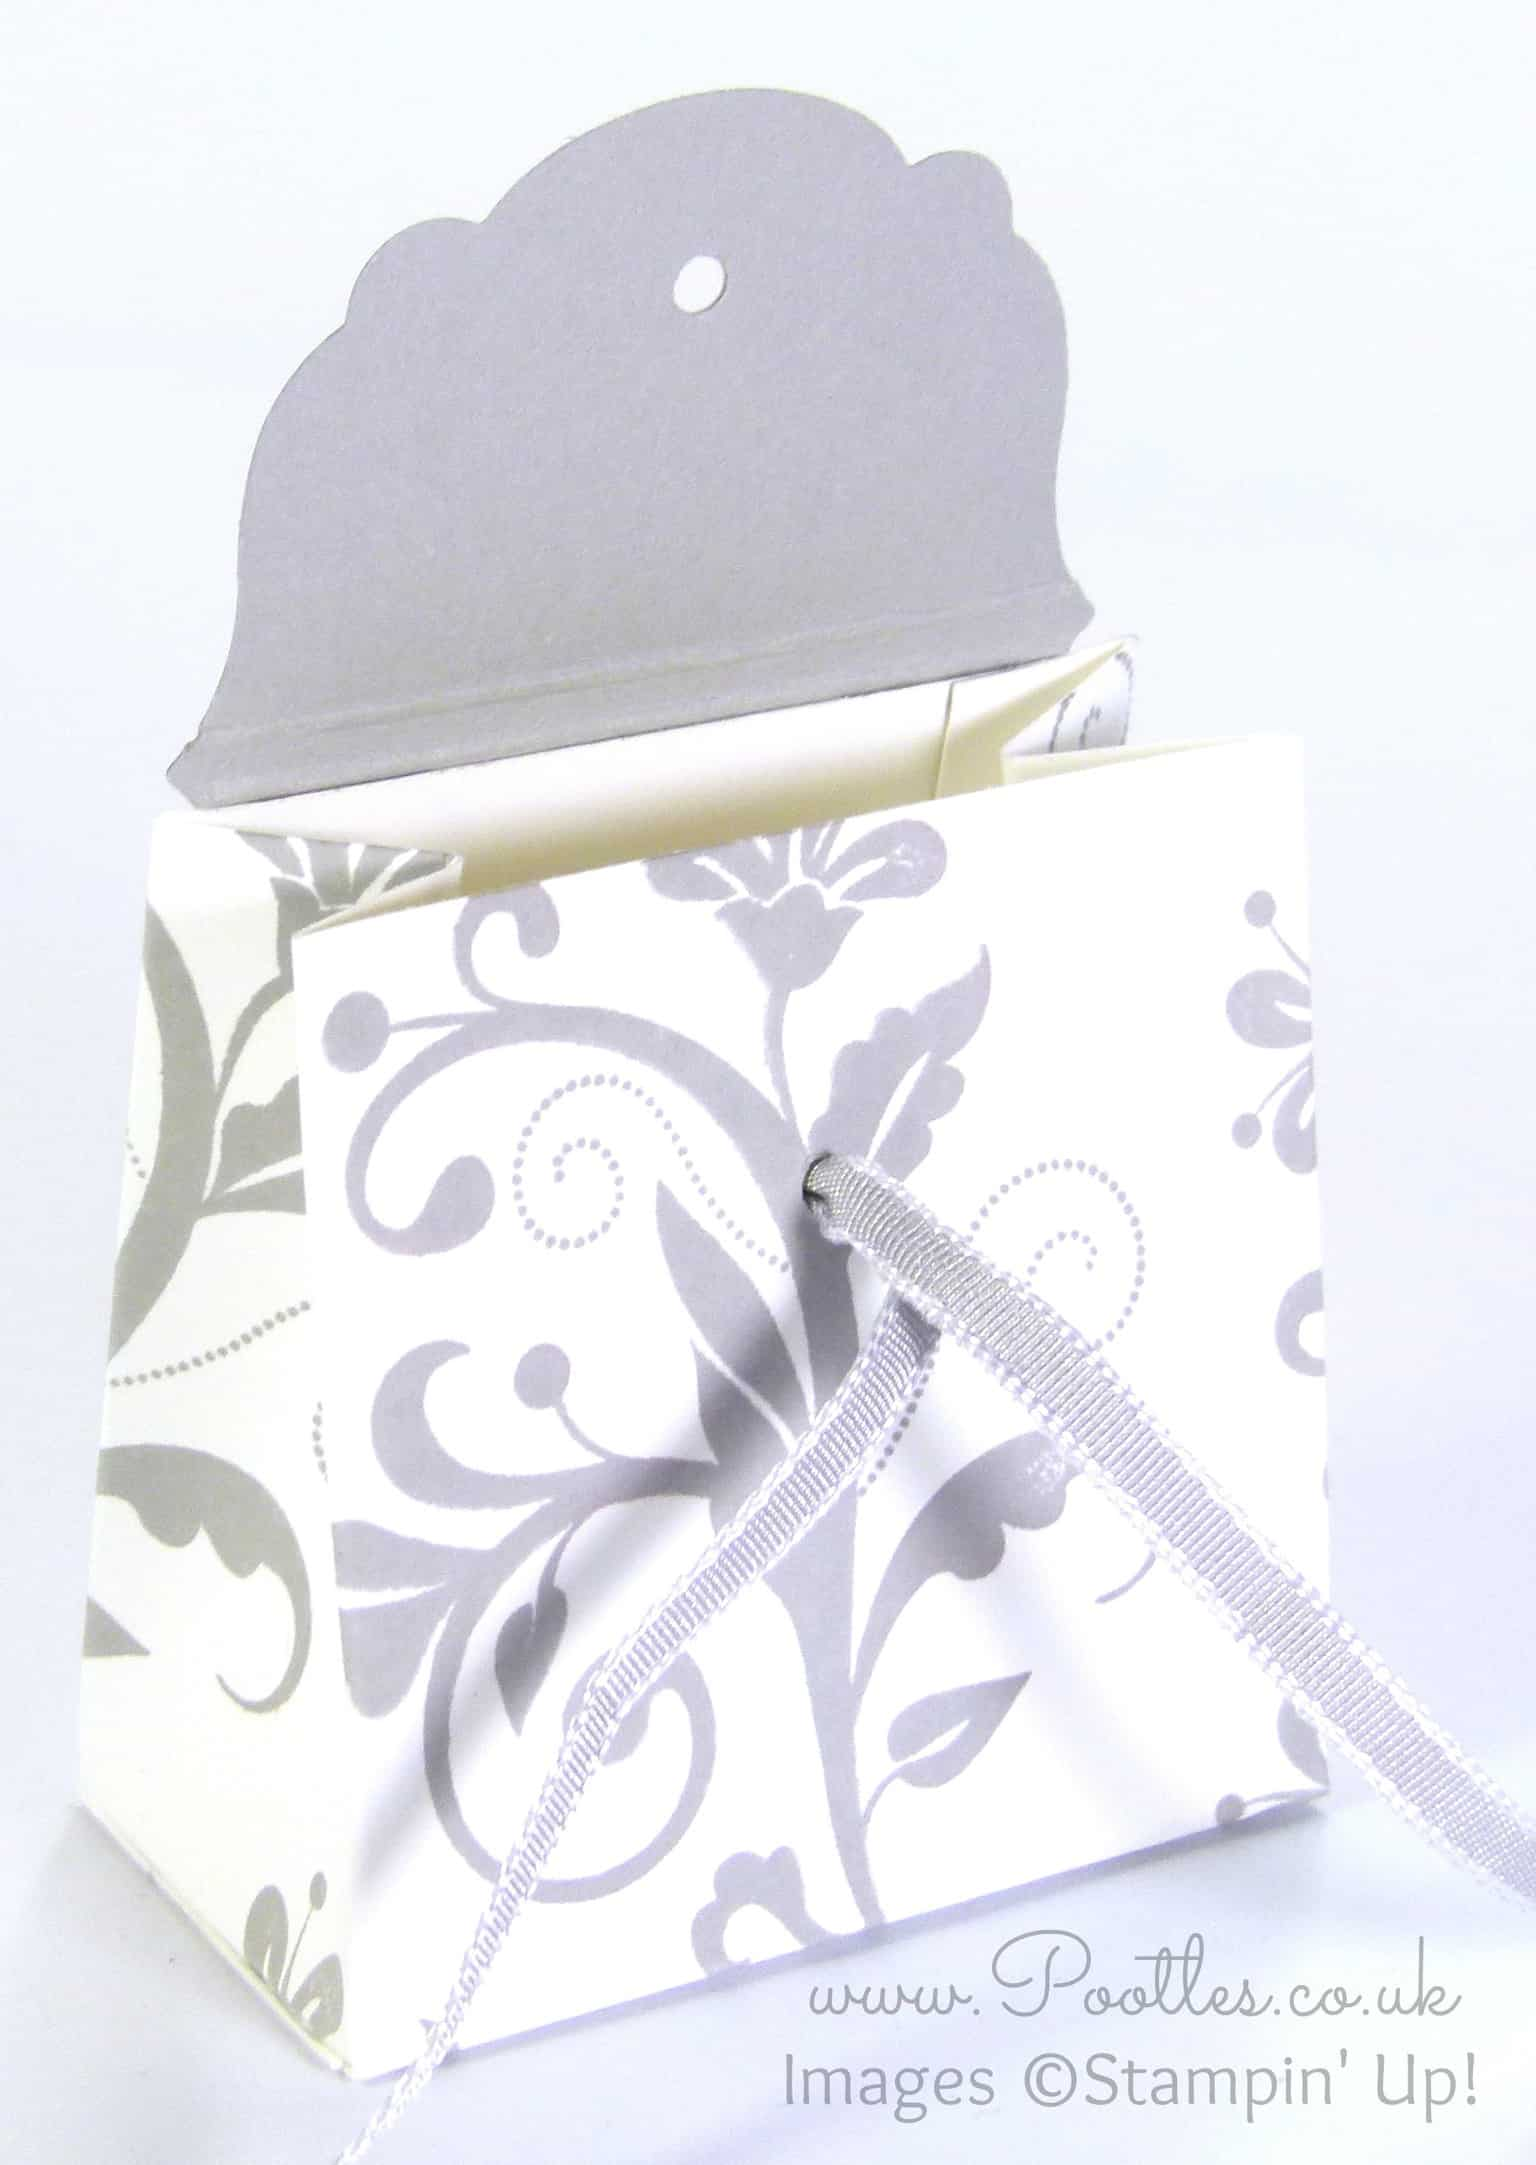 Wedding Favour Box Tutorial Using Stampin' Up! Supplies